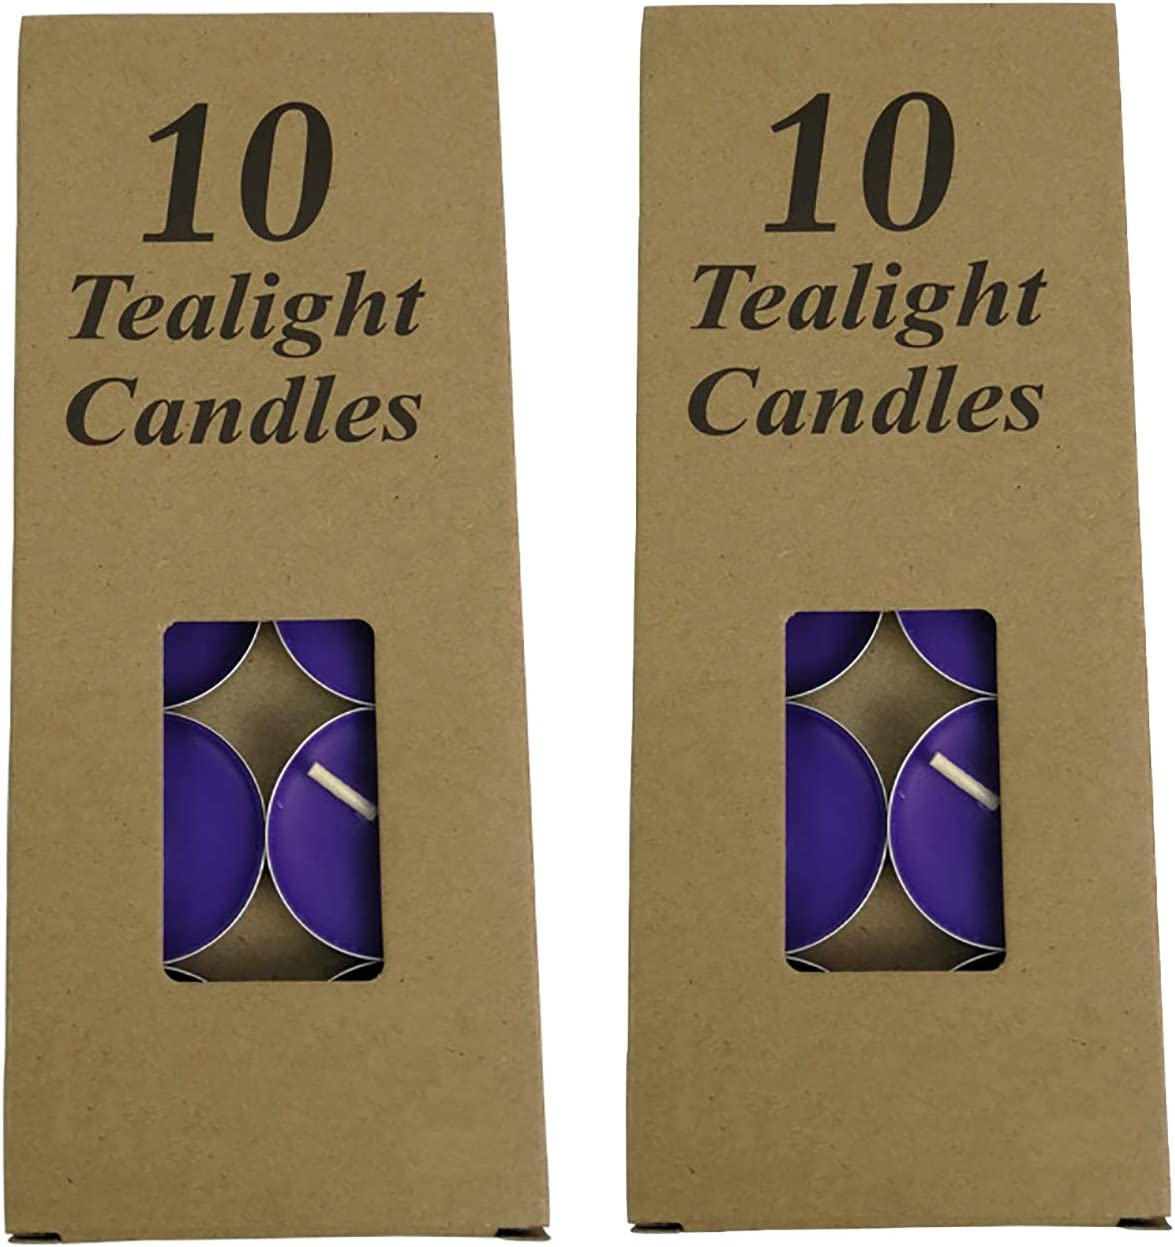 KEQKEV Kraft Paper Tea Lights Candles Super beauty product restock quality top Small Box Cheap bargain -